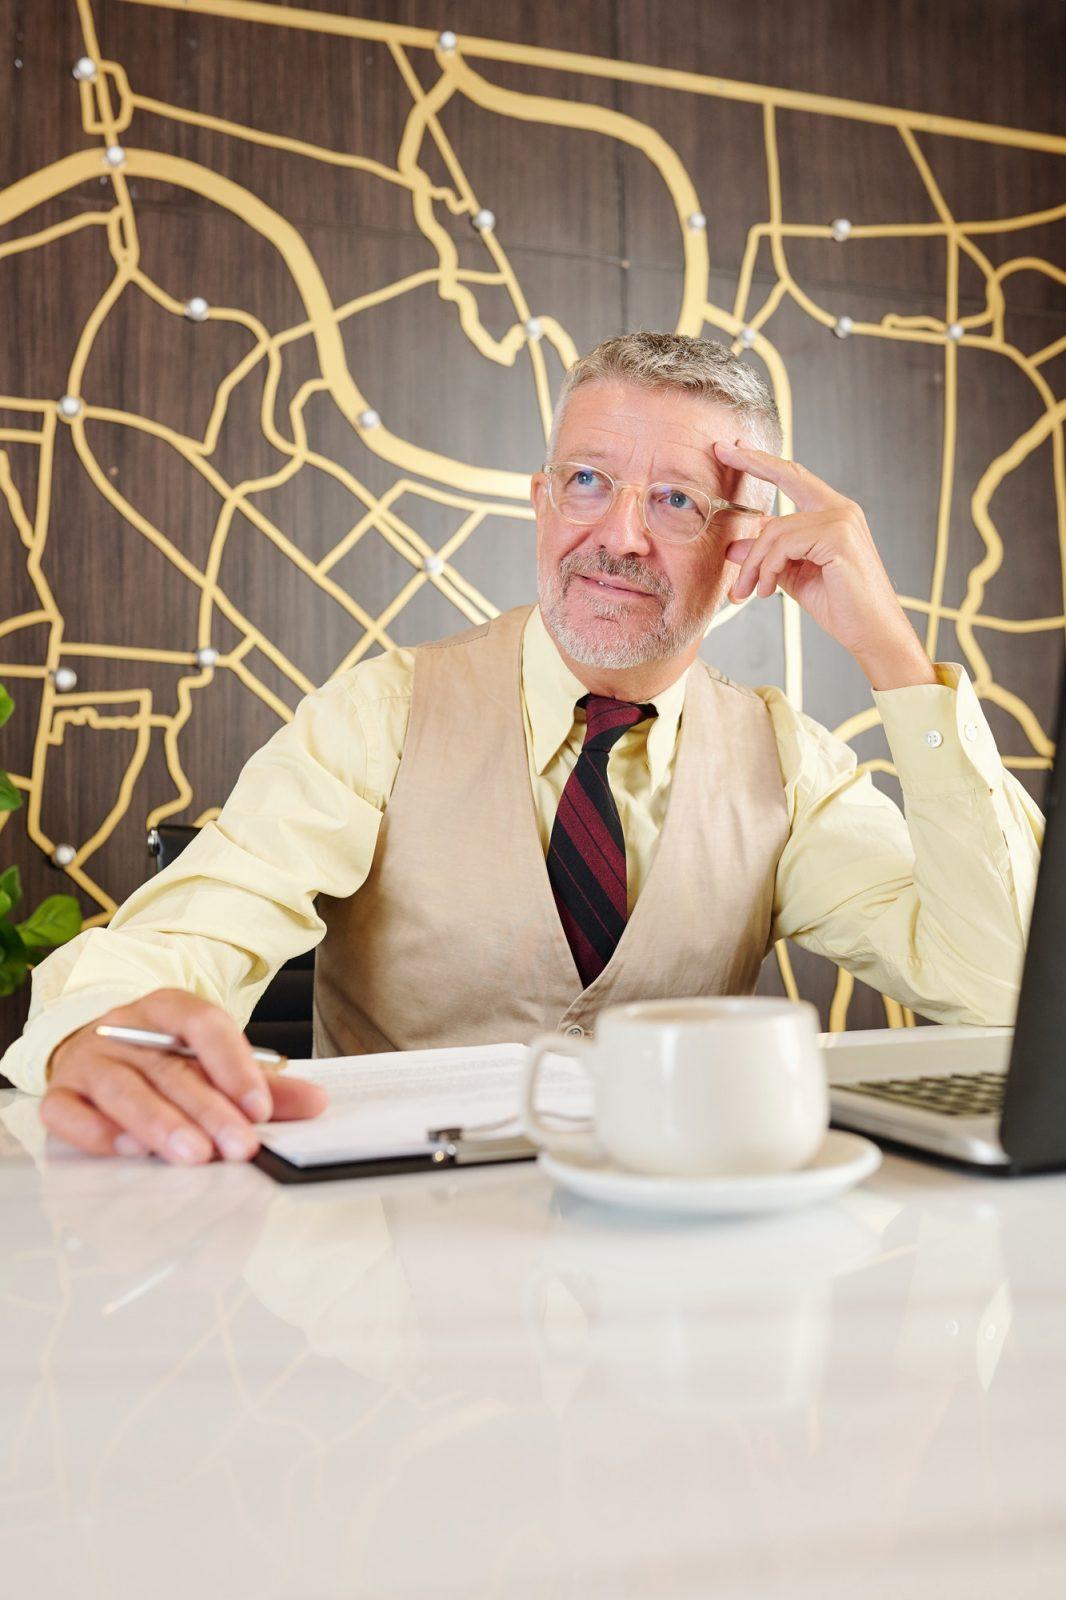 Man working on business plan